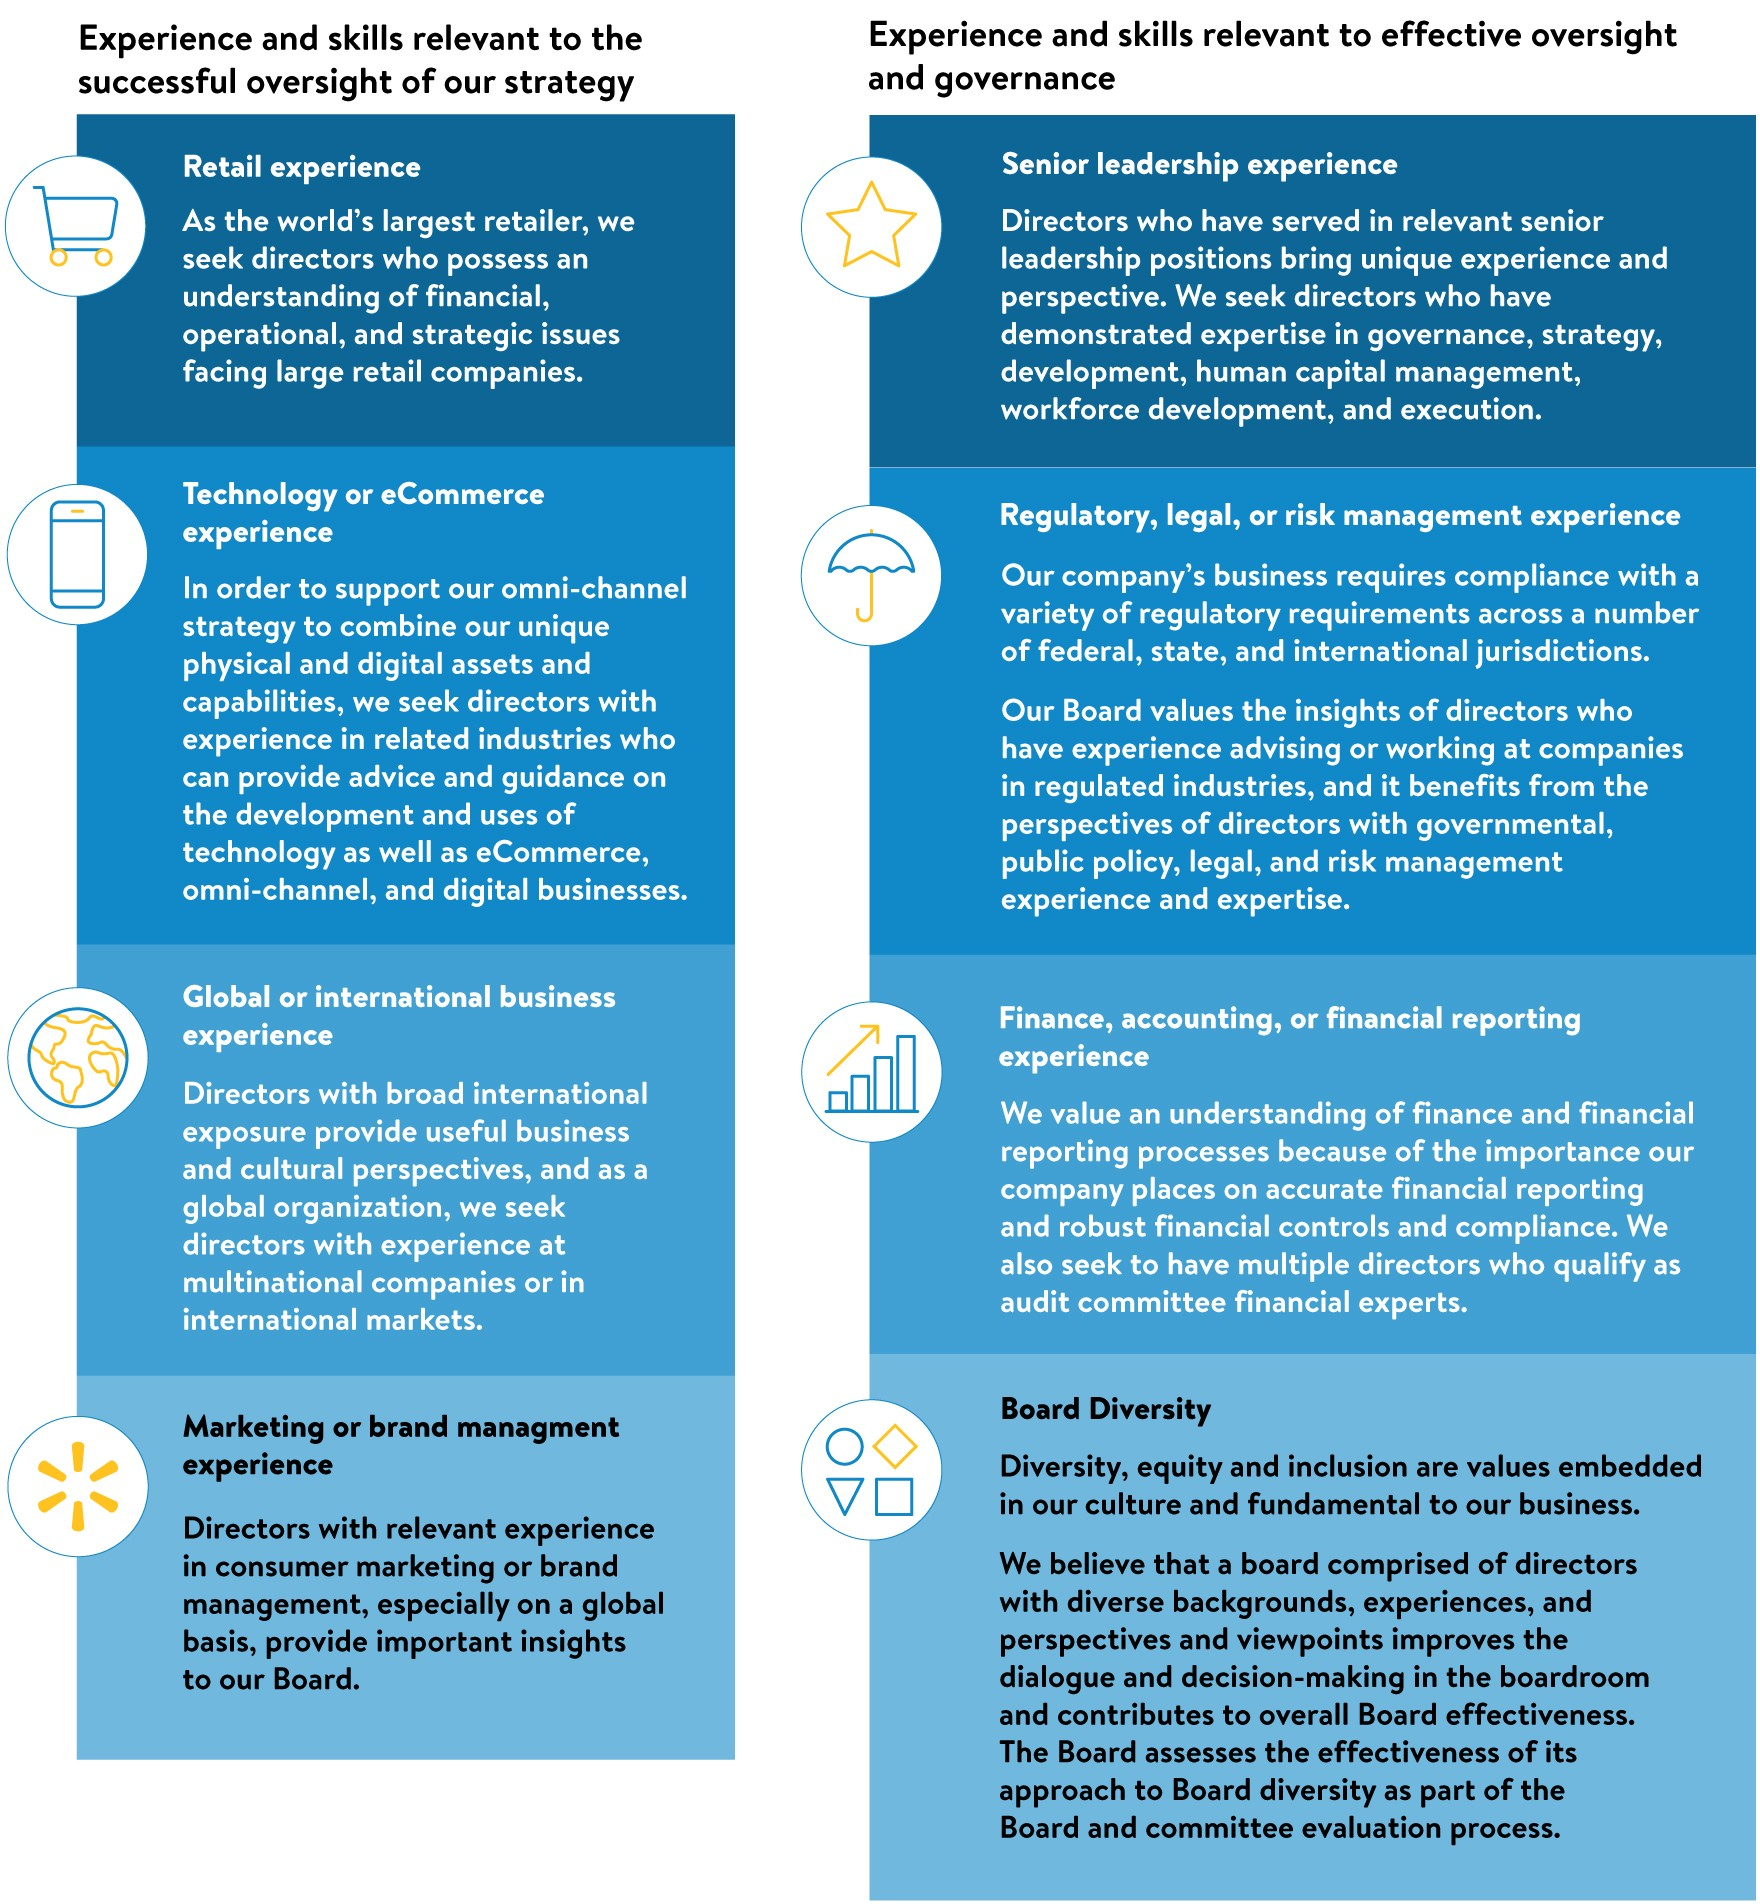 Corporate Governance/relevant-experience-oversight.jpg